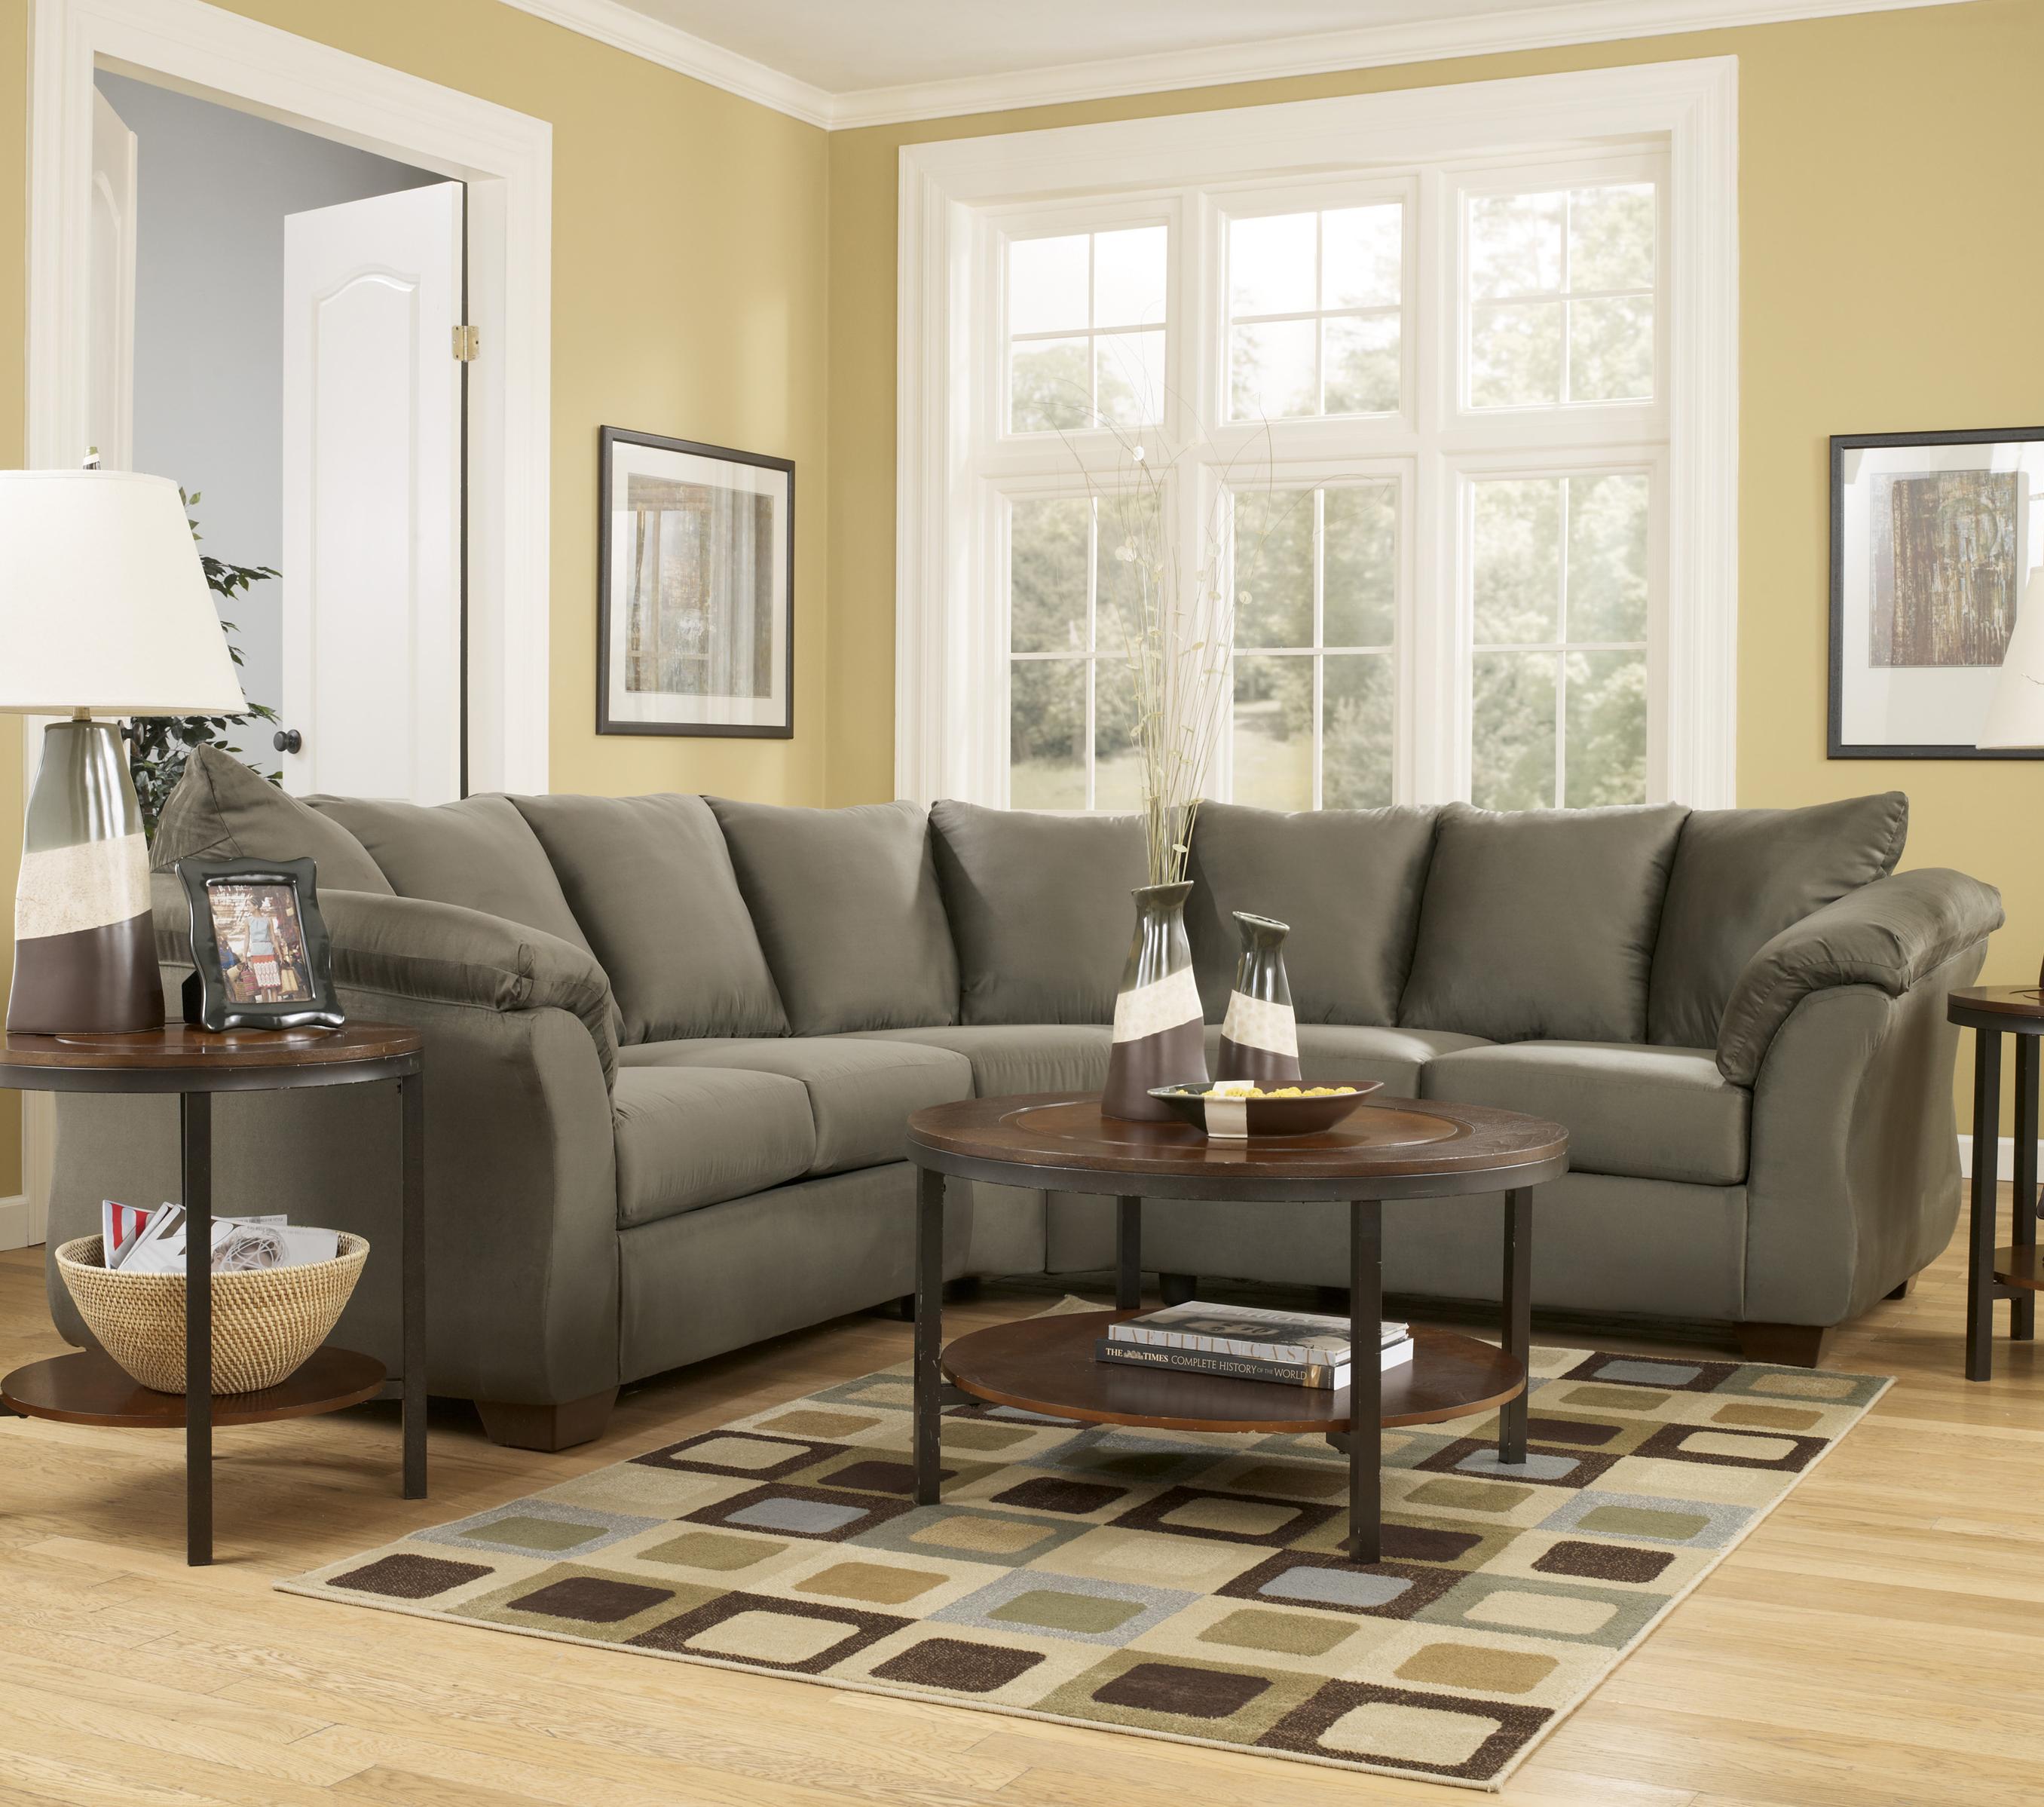 Darcy   Sage (75003) By Signature Design By Ashley   John V Schultz  Furniture   Signature Design By Ashley Darcy   Sage Dealer